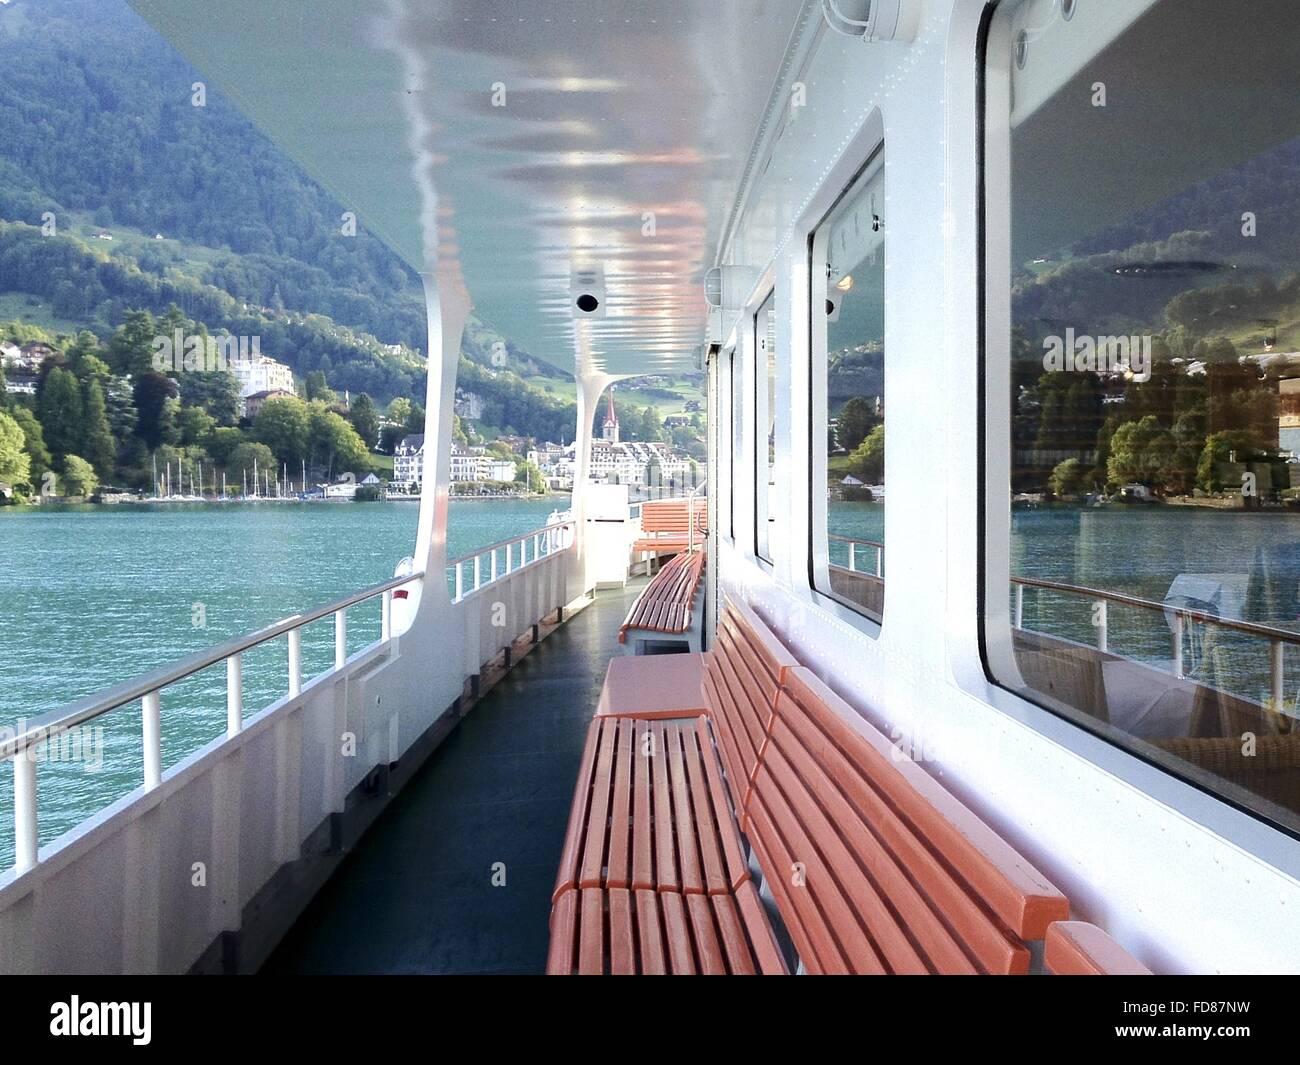 Interior Of Passenger Ship - Stock Image